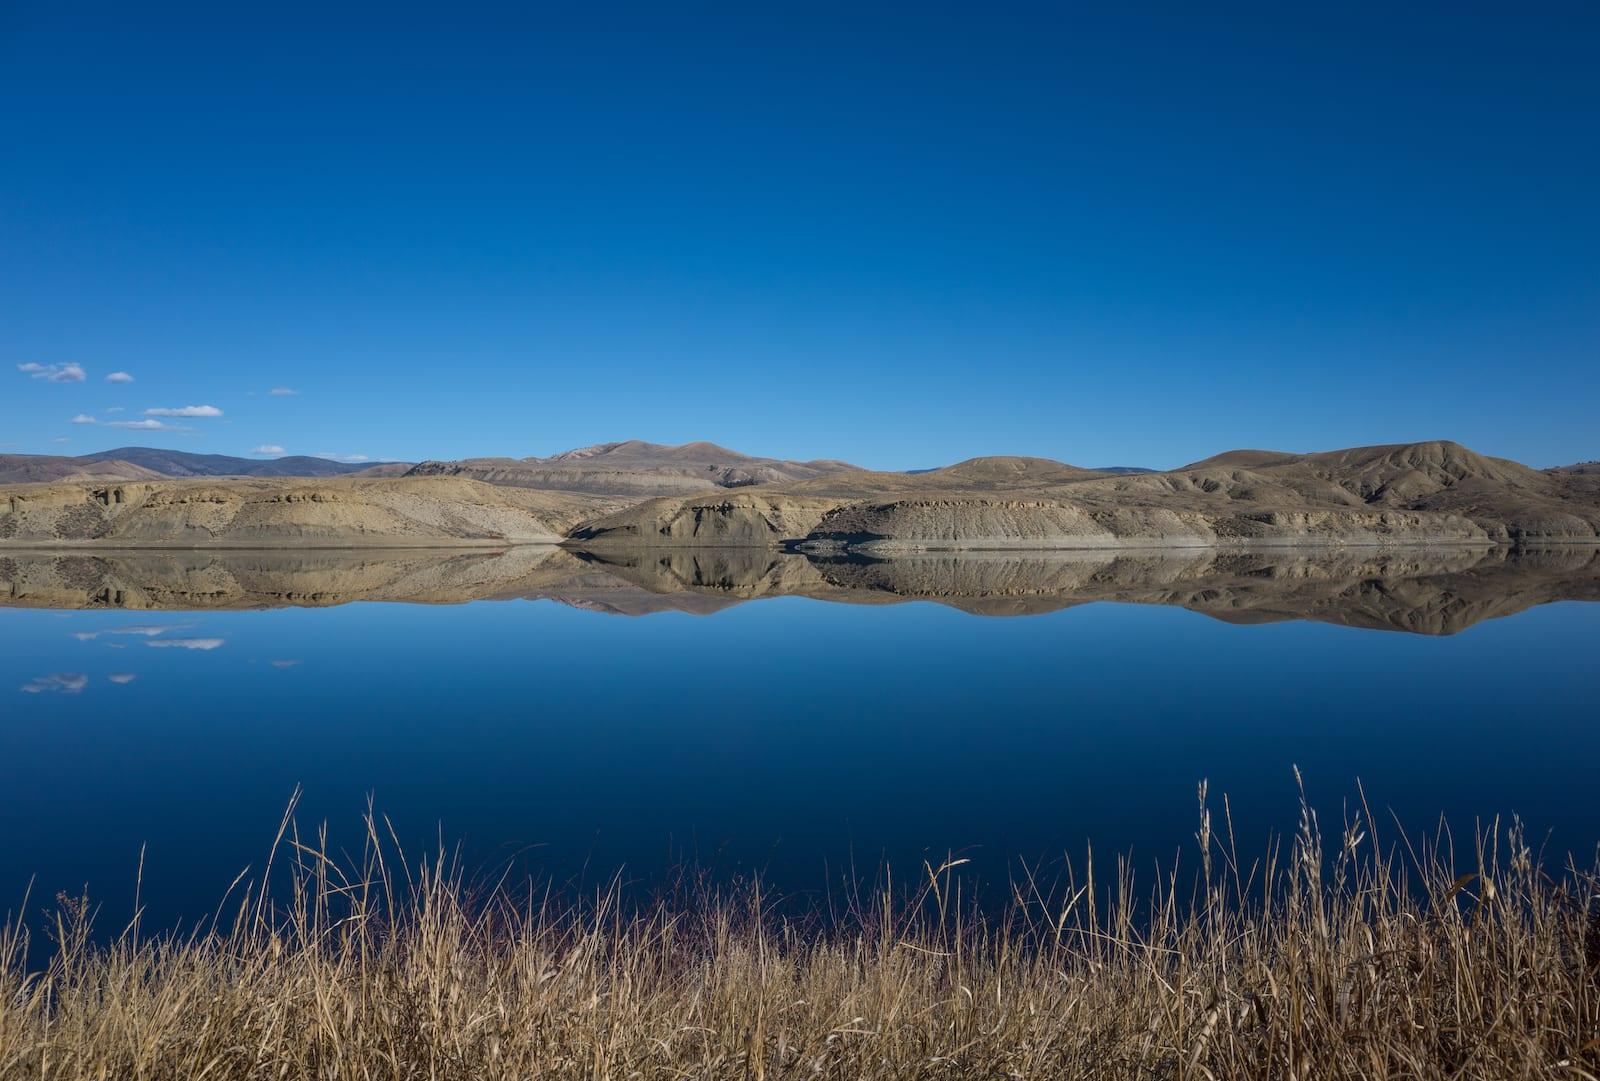 Wolford Mountain Reservoir Stillwater Kremmling CO